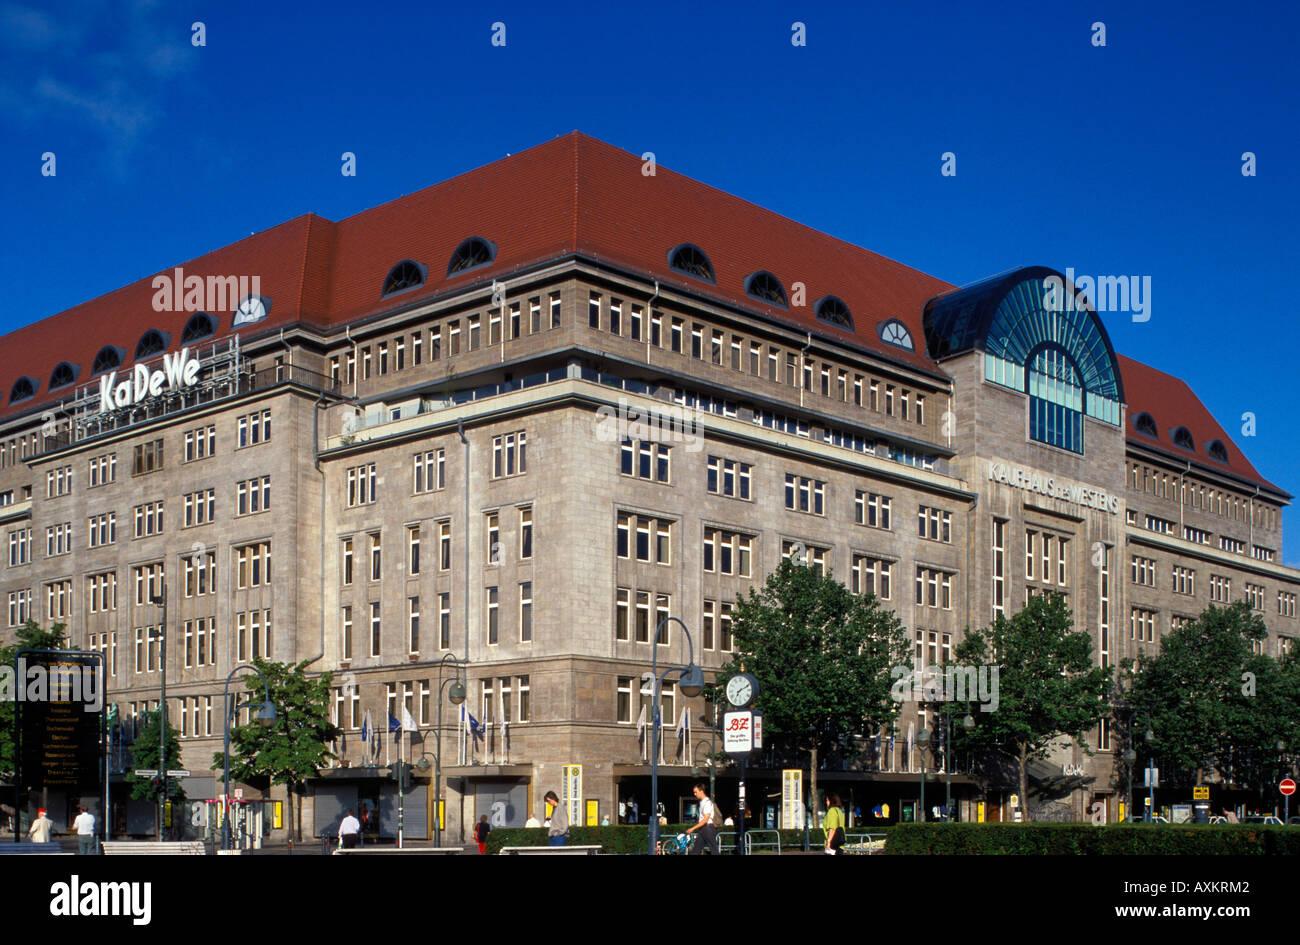 berlin the ka de we department store stockfoto lizenzfreies bild 9640065 alamy. Black Bedroom Furniture Sets. Home Design Ideas